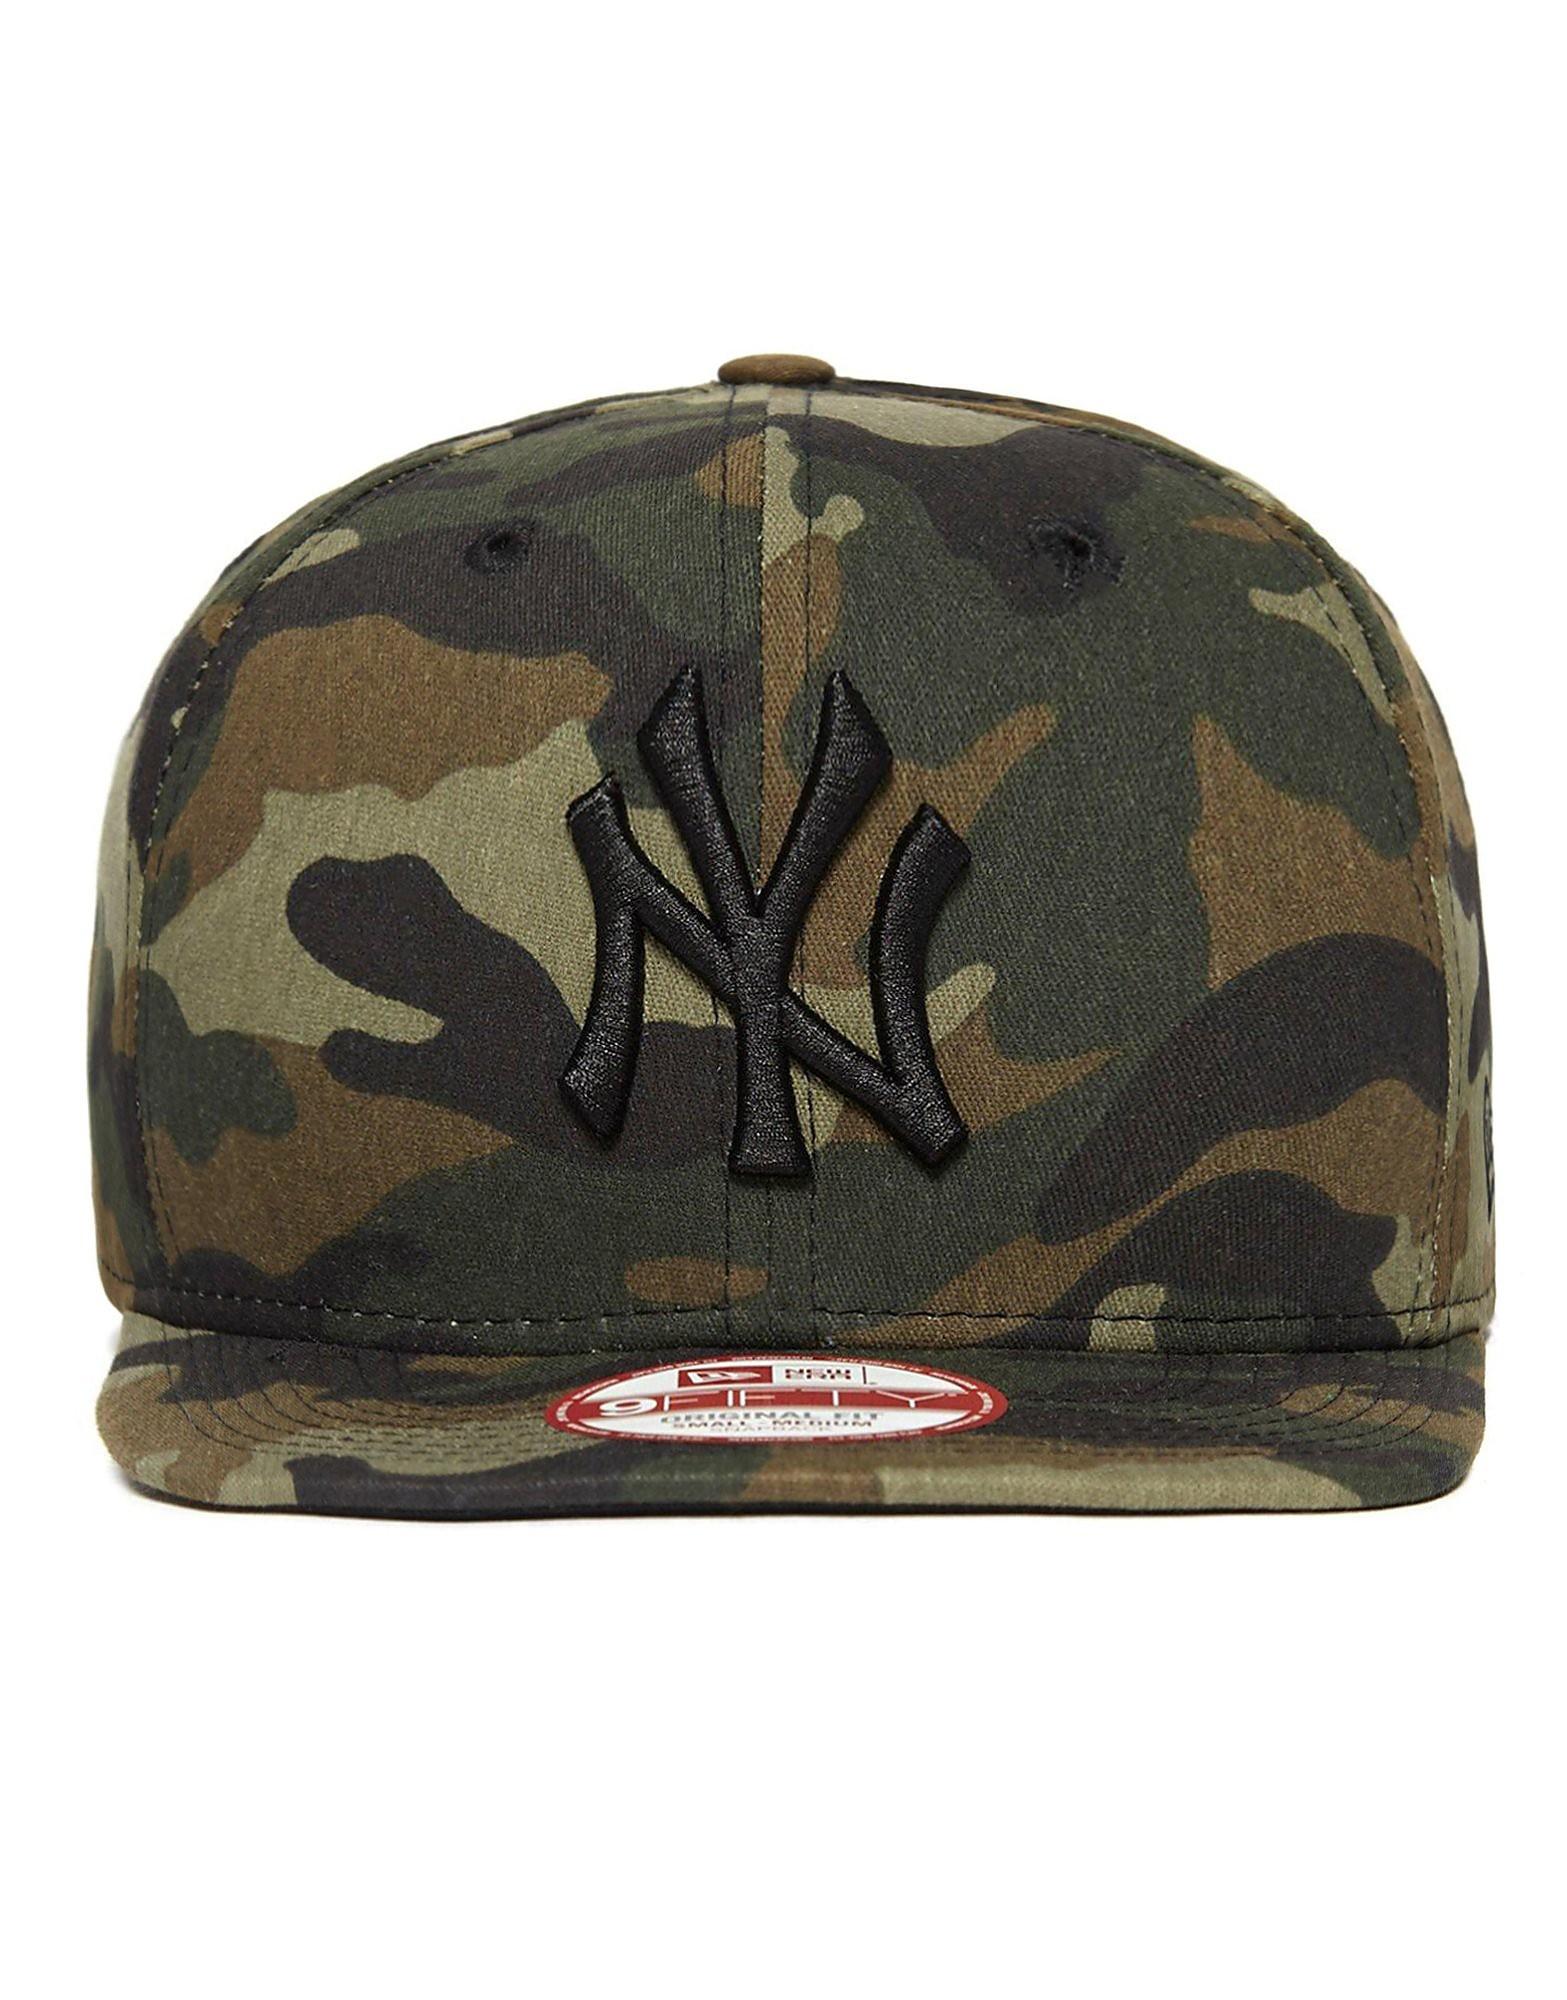 New Era 9FIFTY New York Yankees MLB Snapback Cap